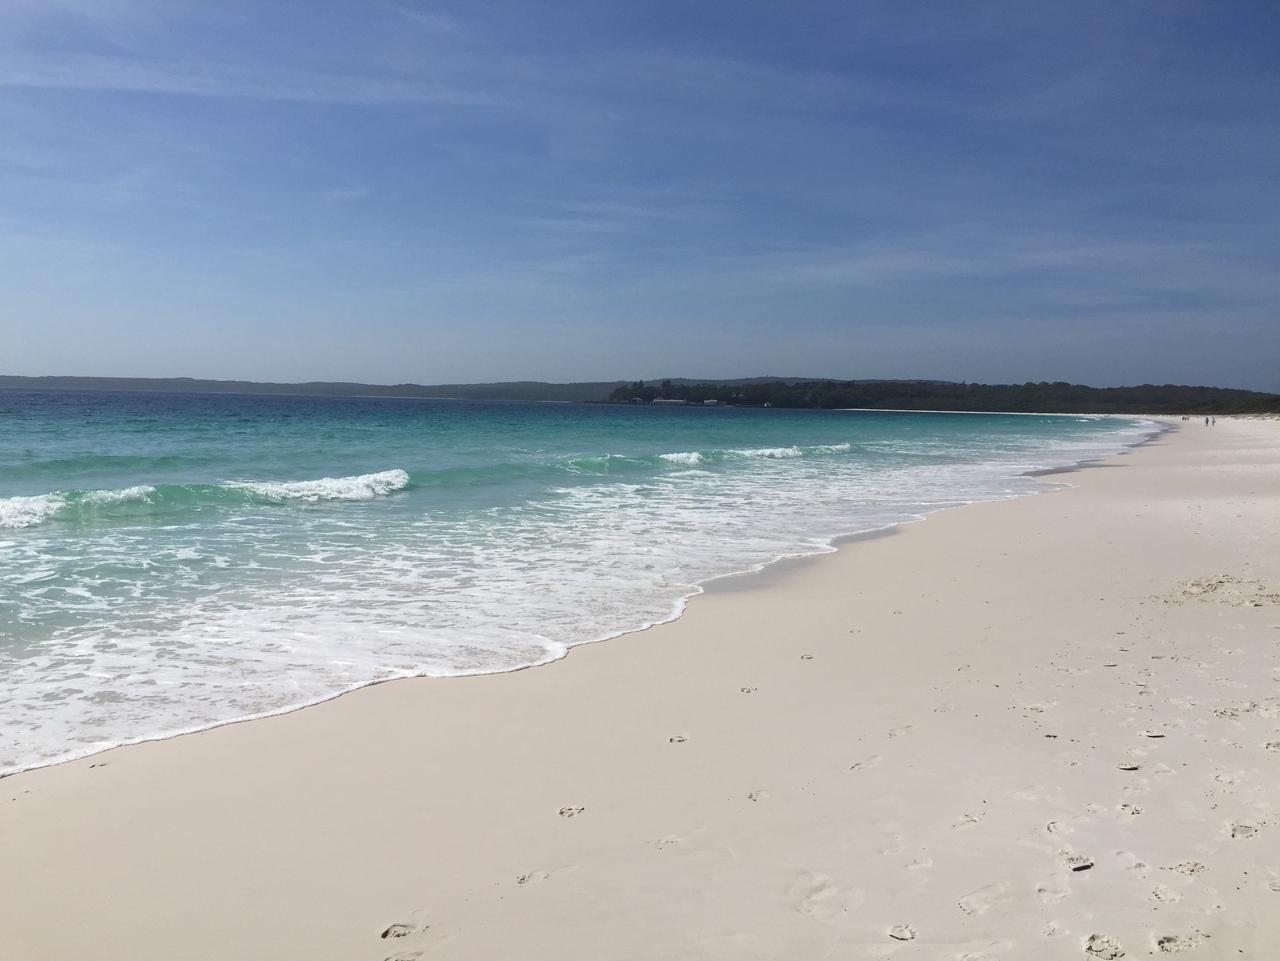 HYAMS BEACH, NSW  ..  John McGourty story  .. Hyams Beach looking south to the naval base.